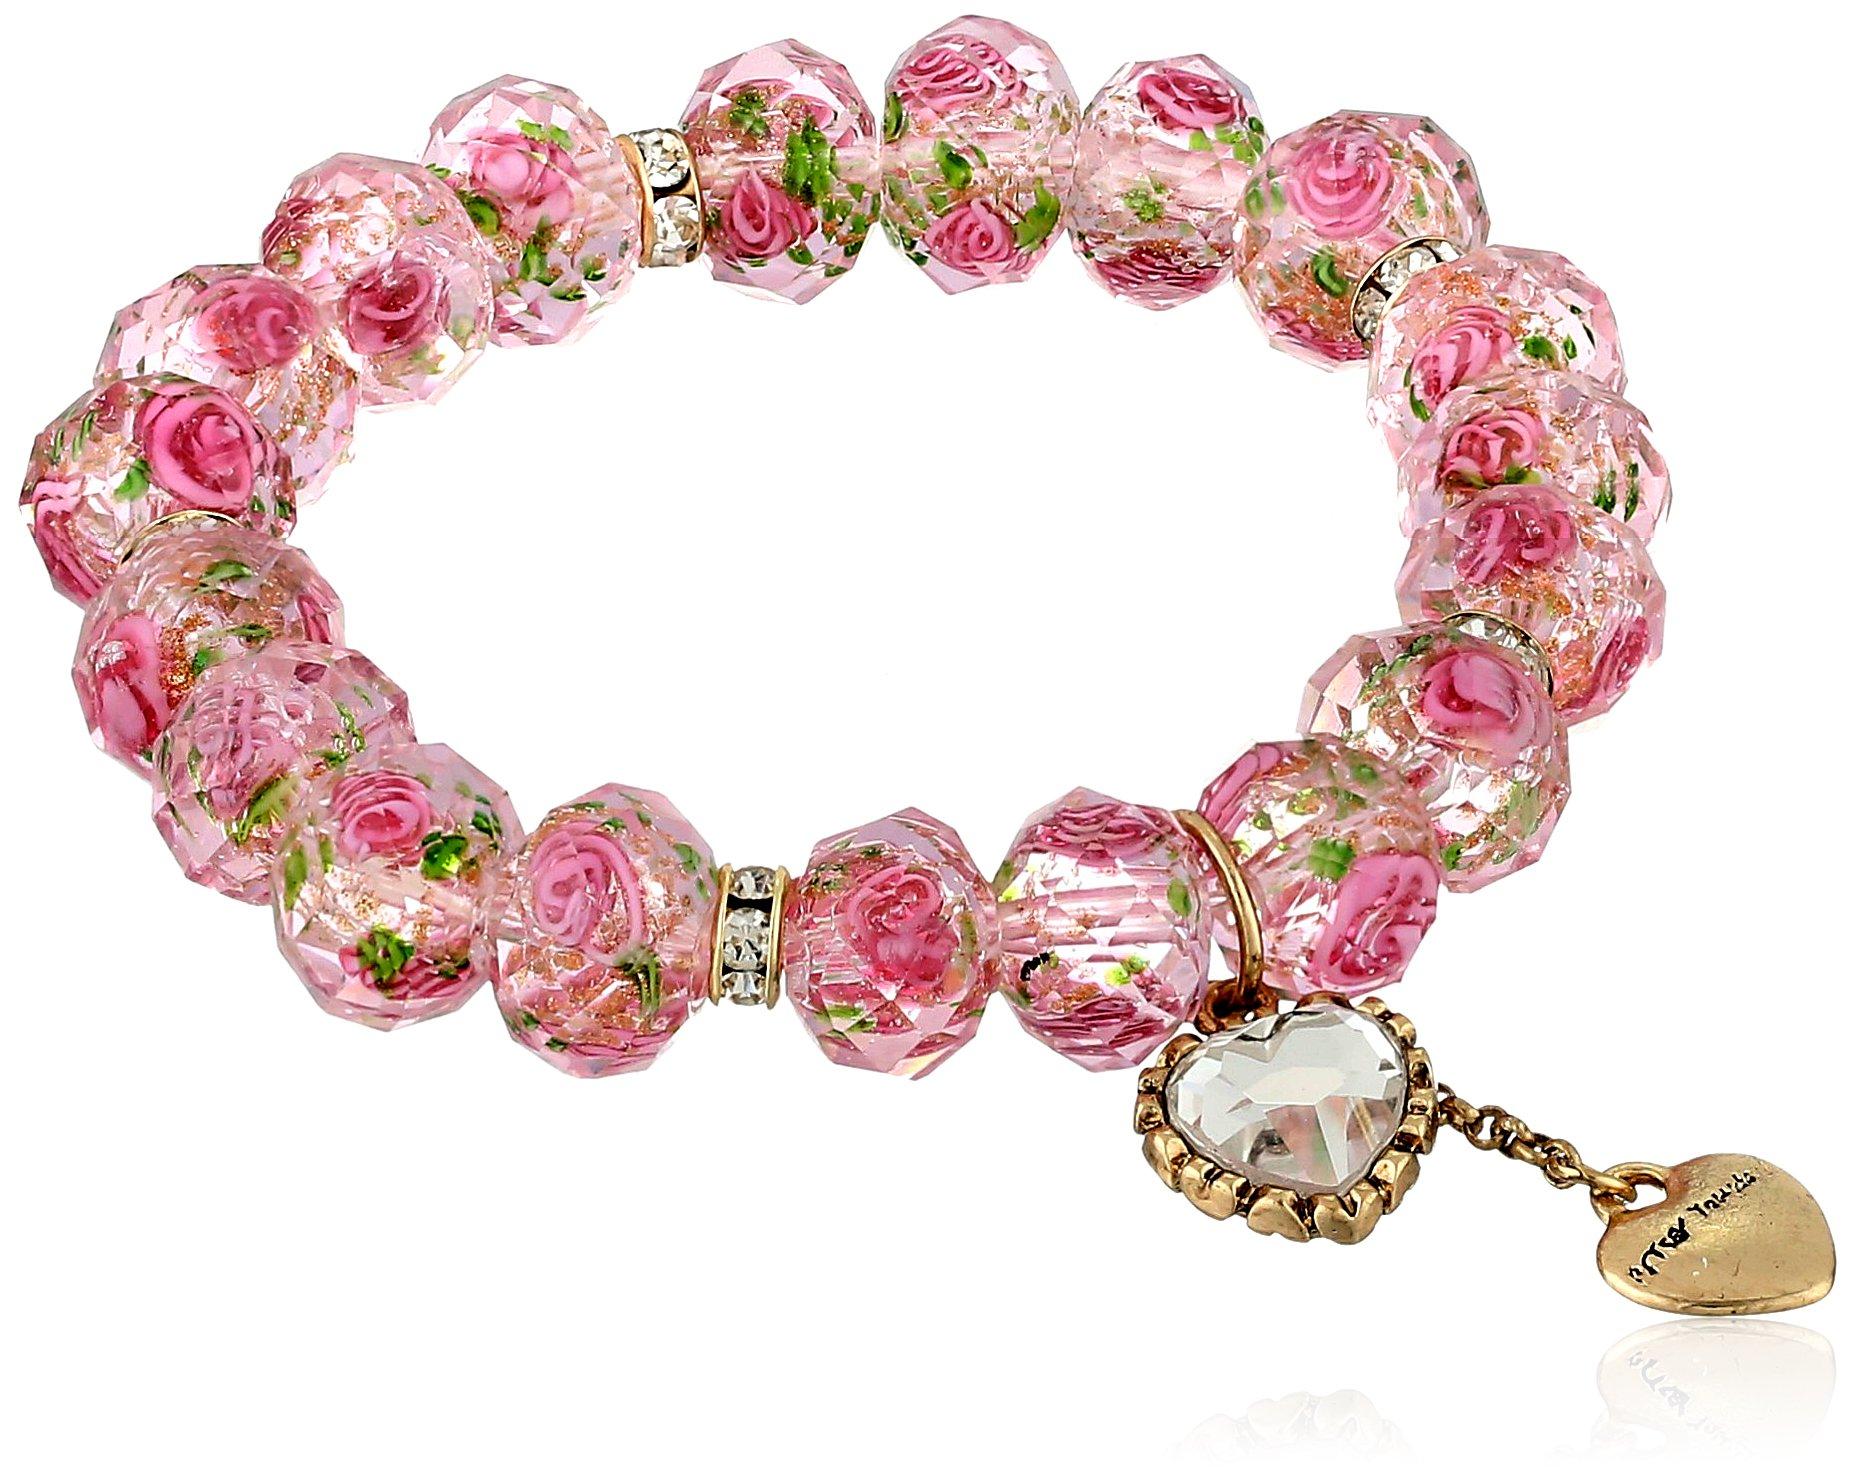 Betsey Johnson ''Tzarina Princess'' Pink Flower Bead Stretch Bracelet, 2.5'' by Betsey Johnson